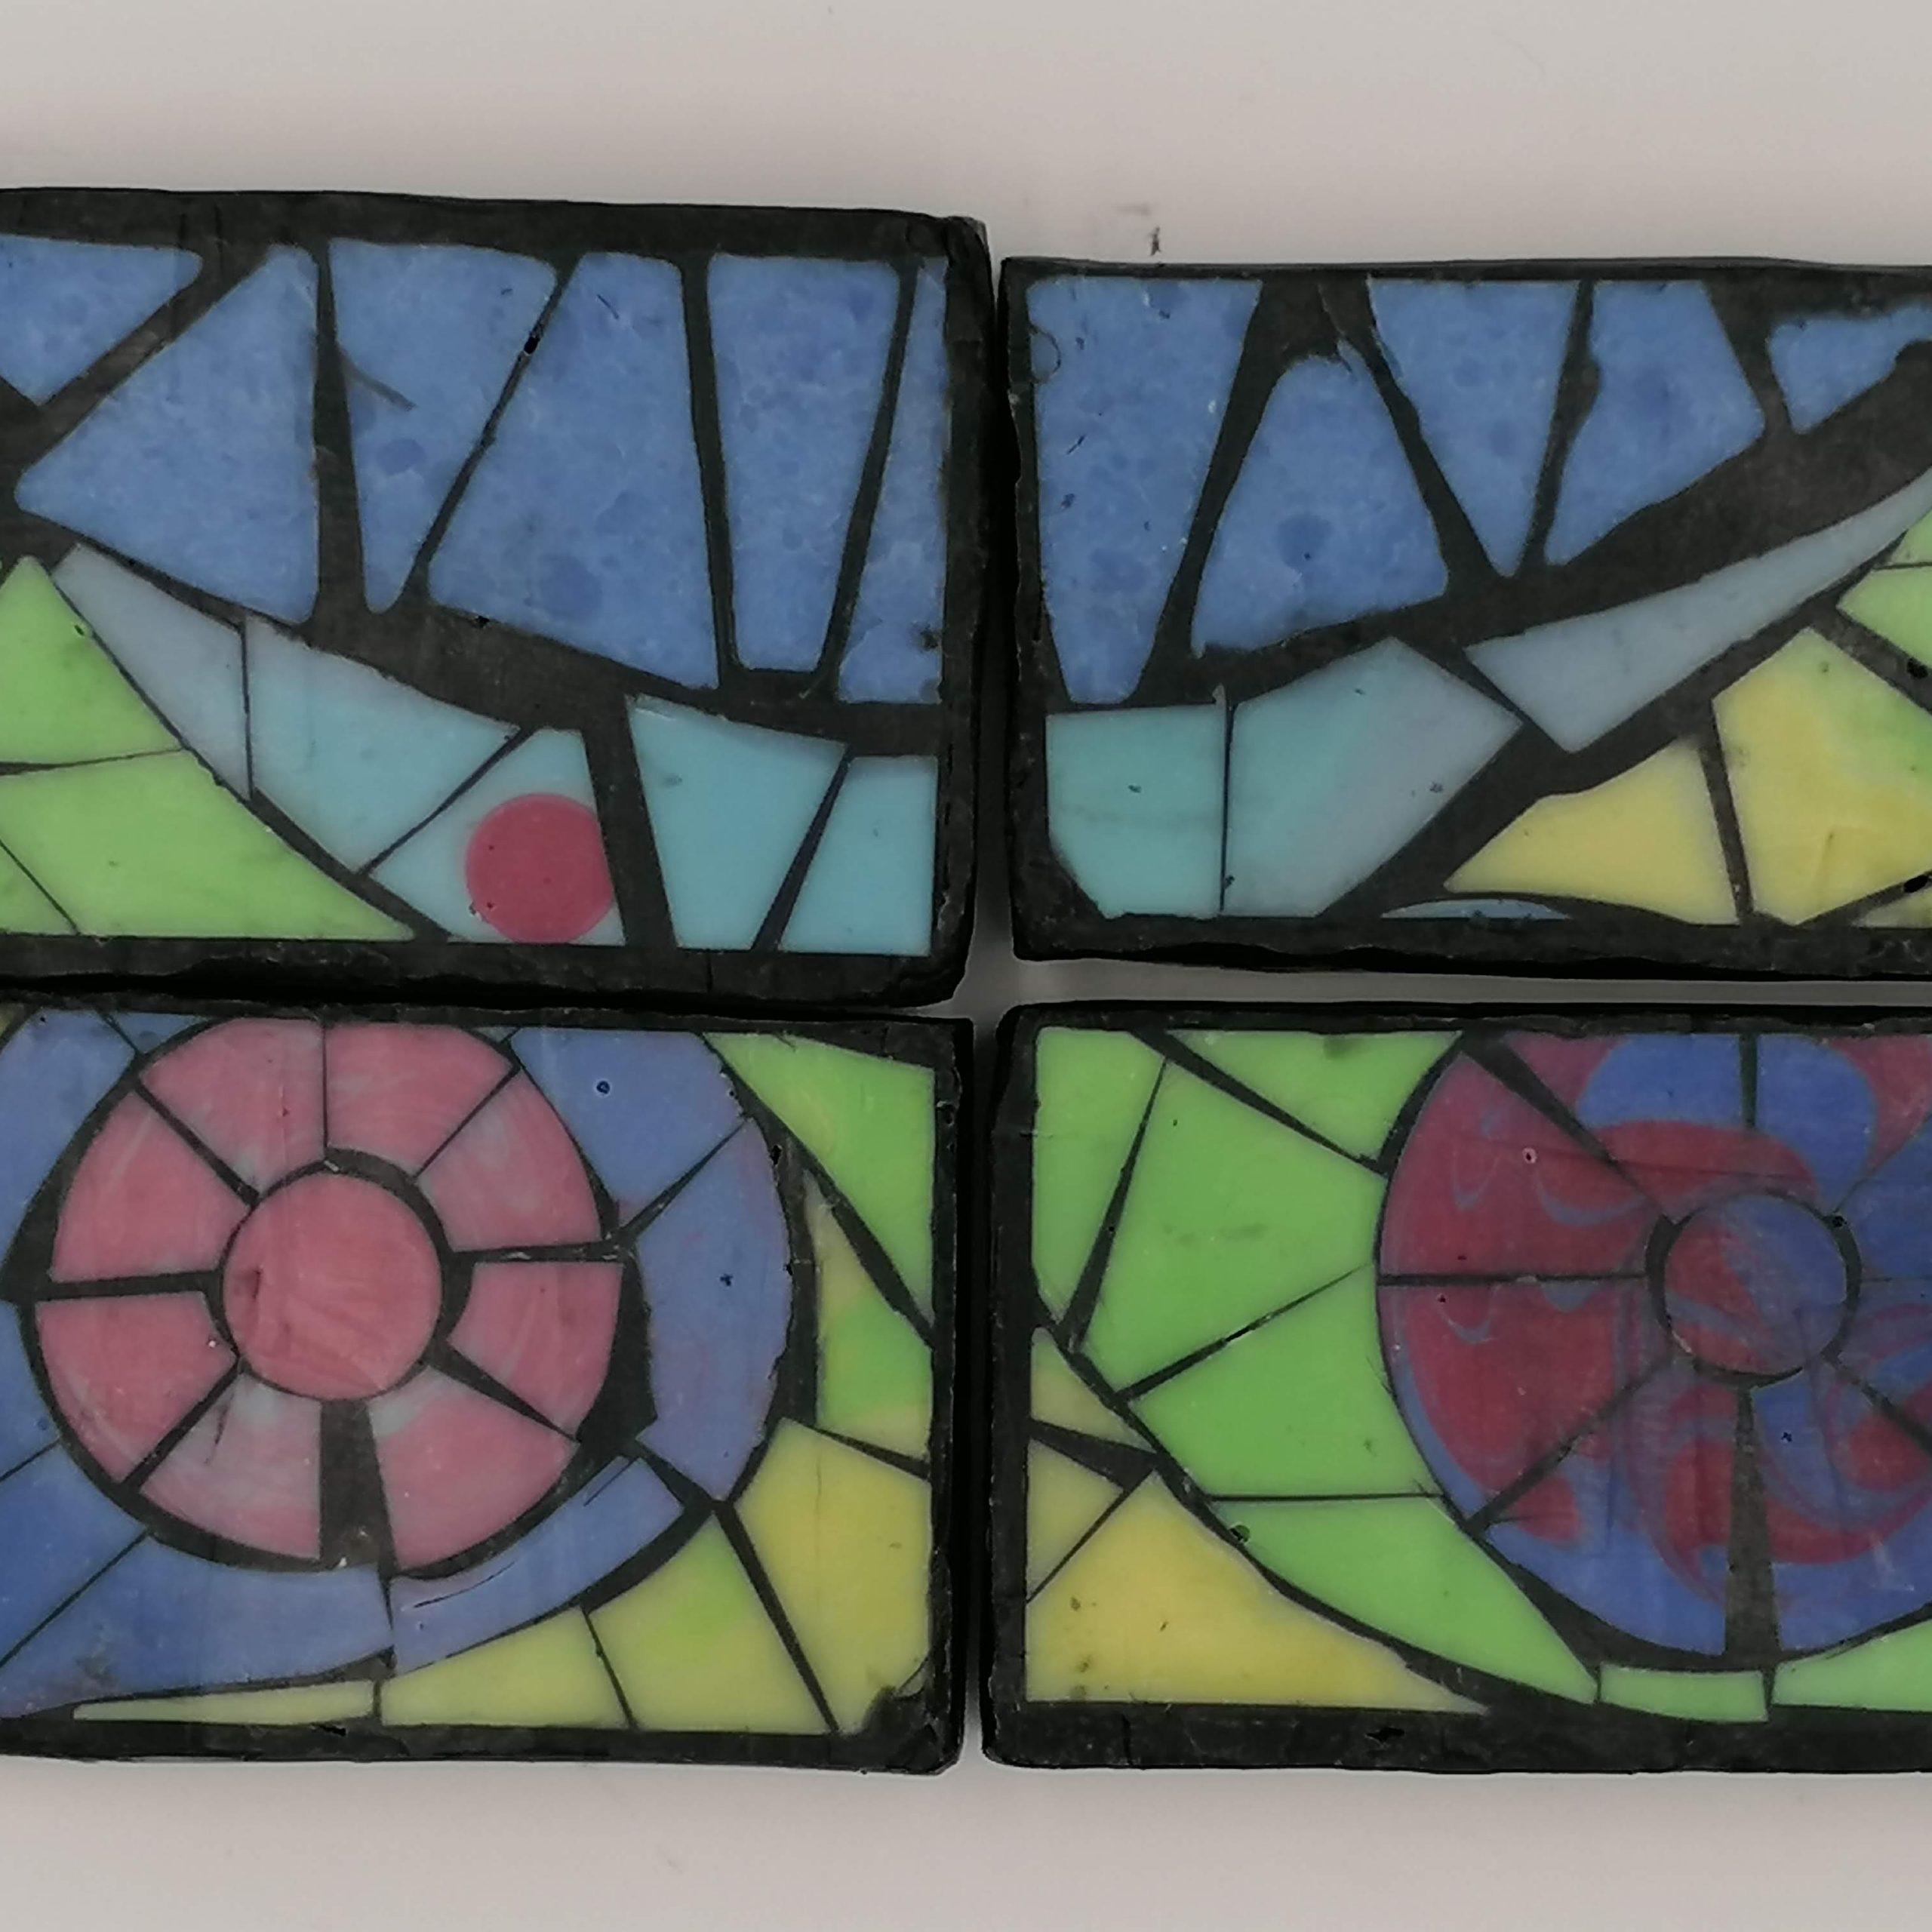 verbena island mosaic soap